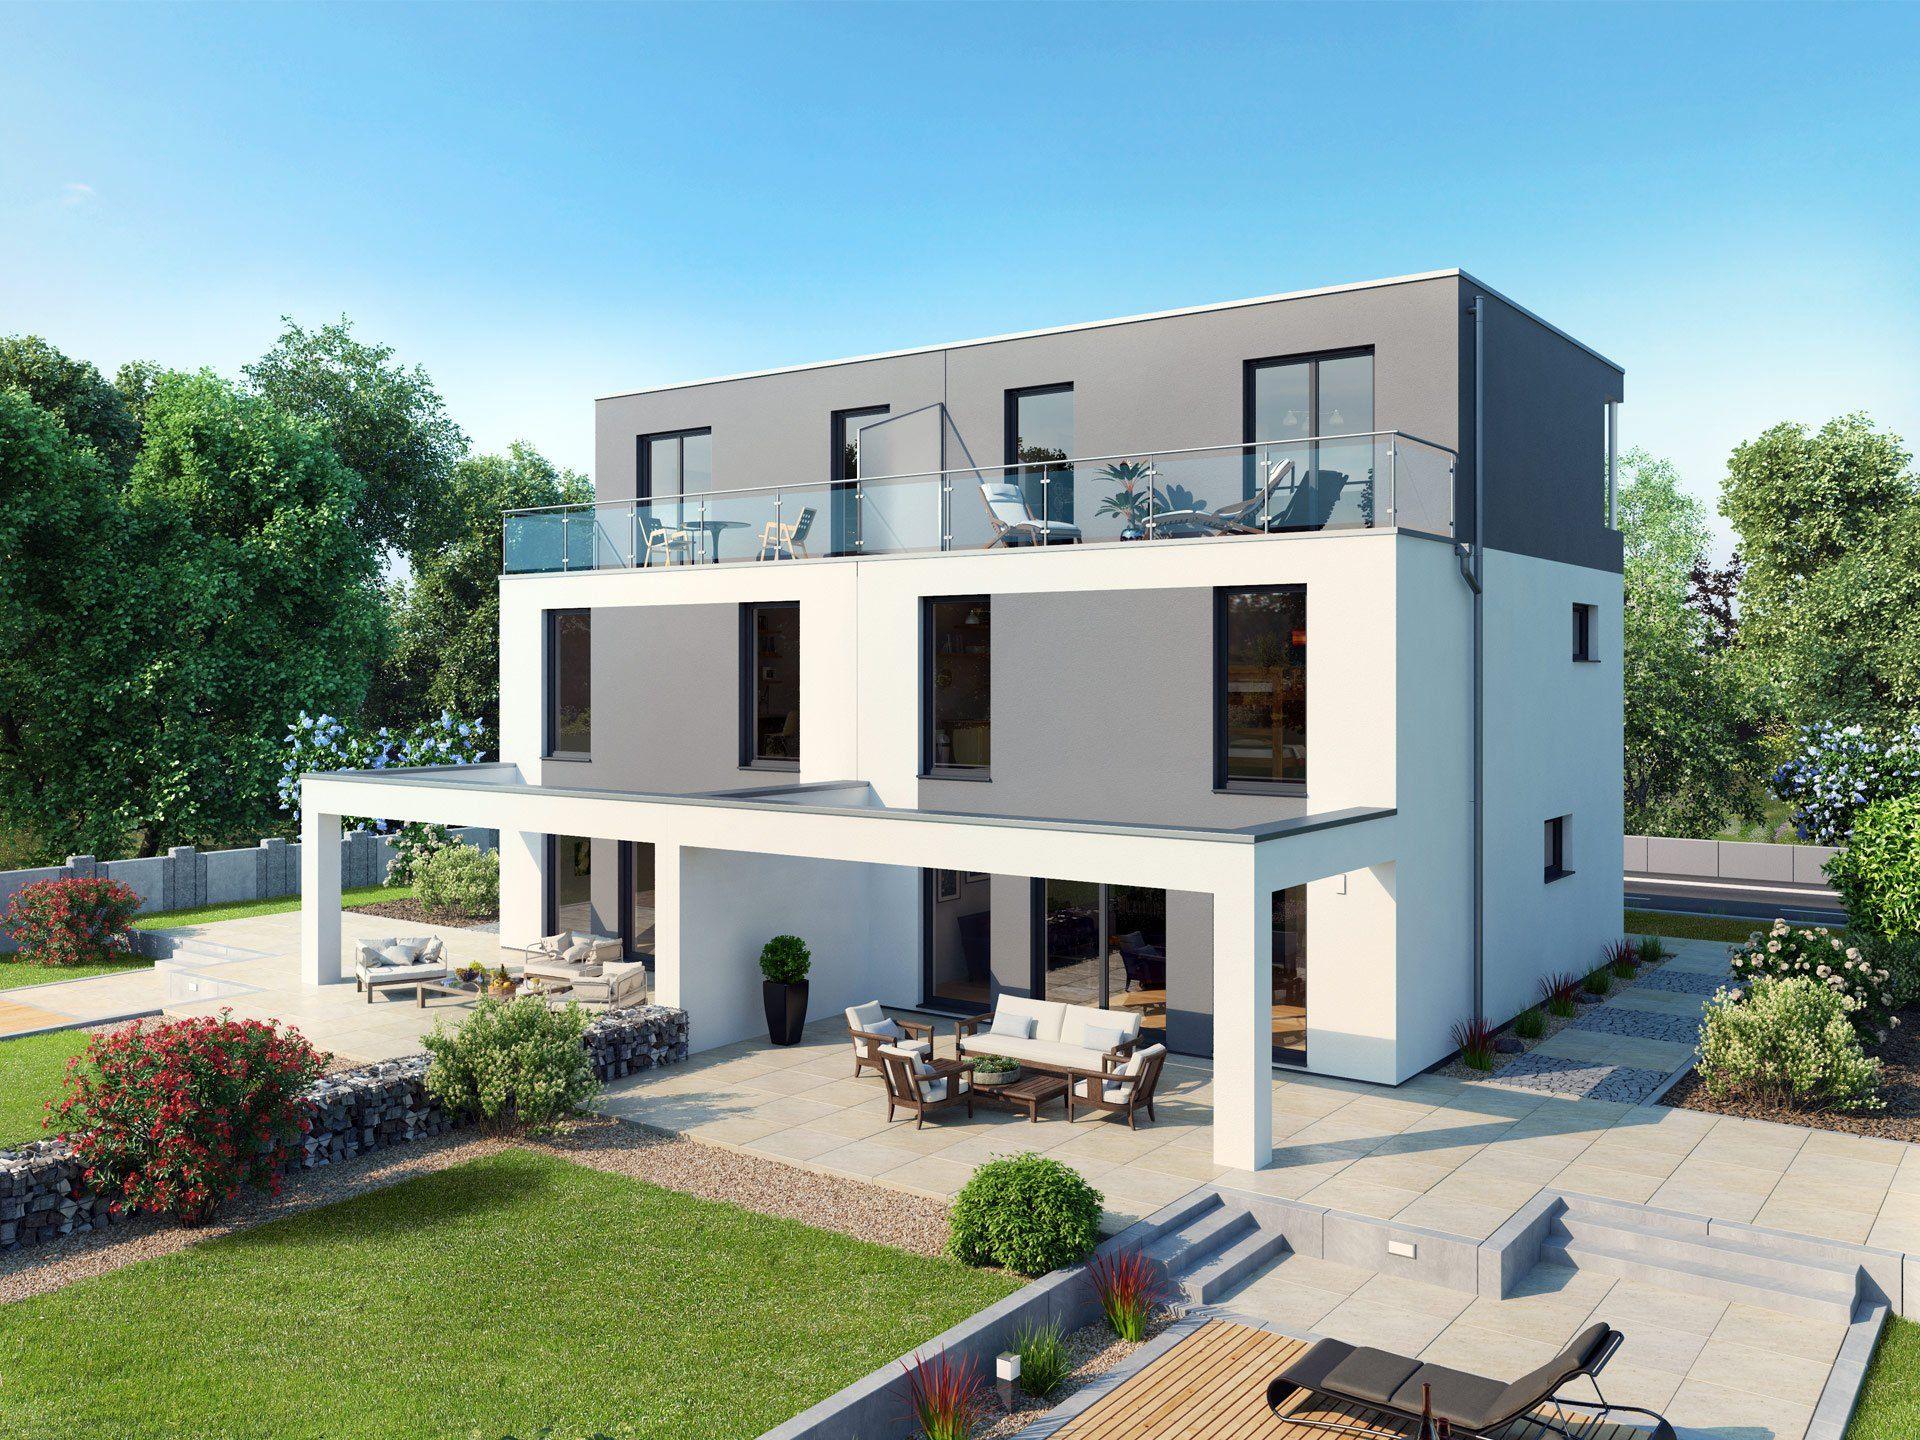 Beispielhaus 11.0   Ytong Bausatzhaus